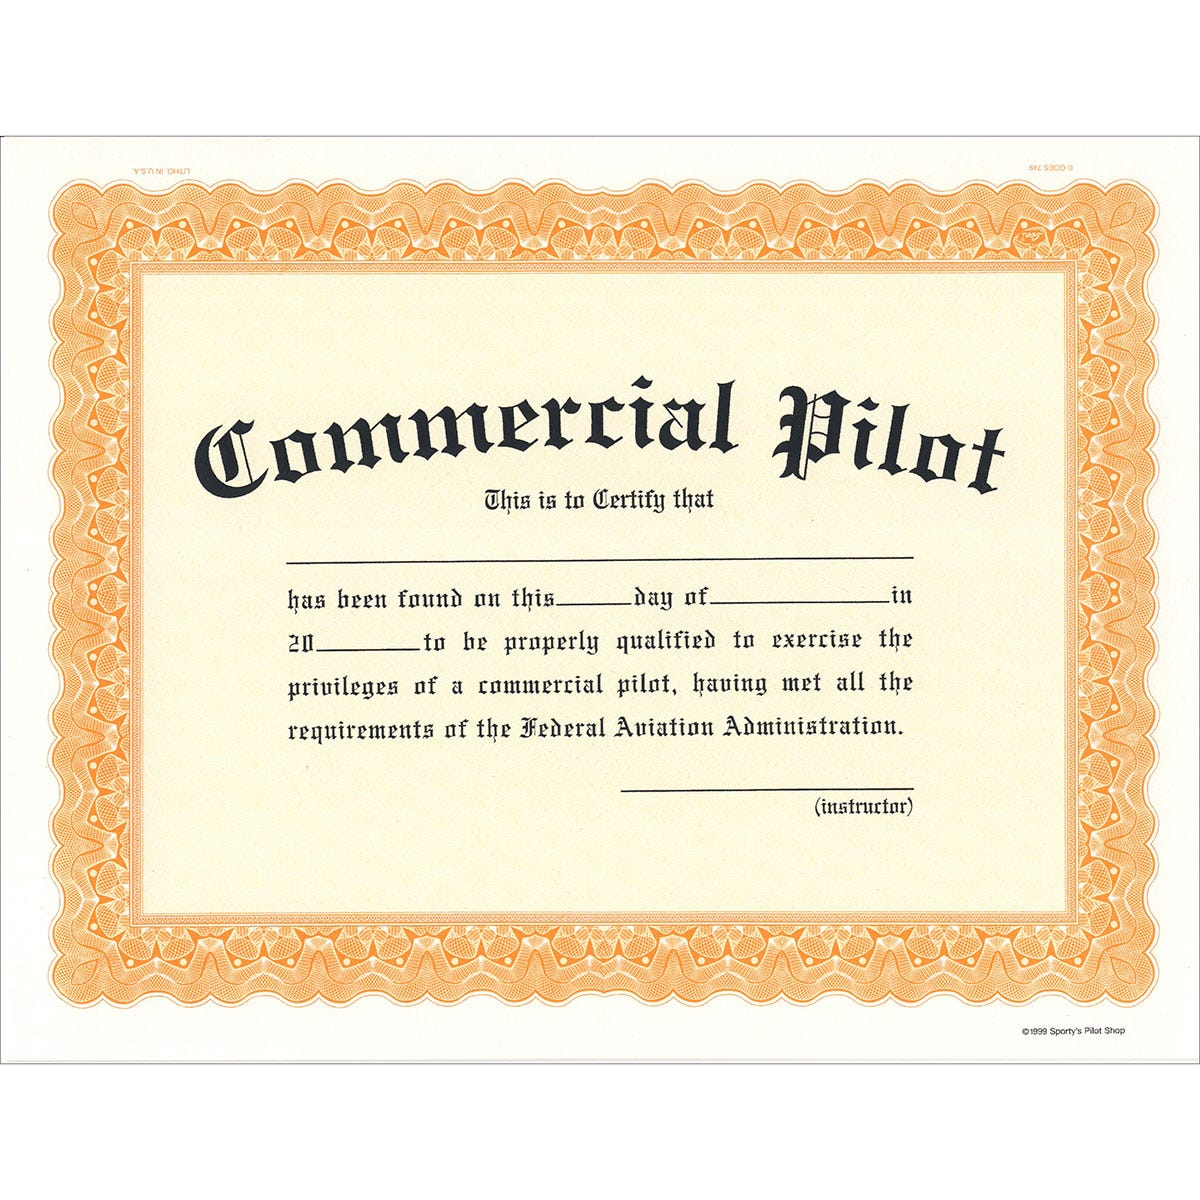 Commercial Pilot Certificate - from Sporty\'s Pilot Shop